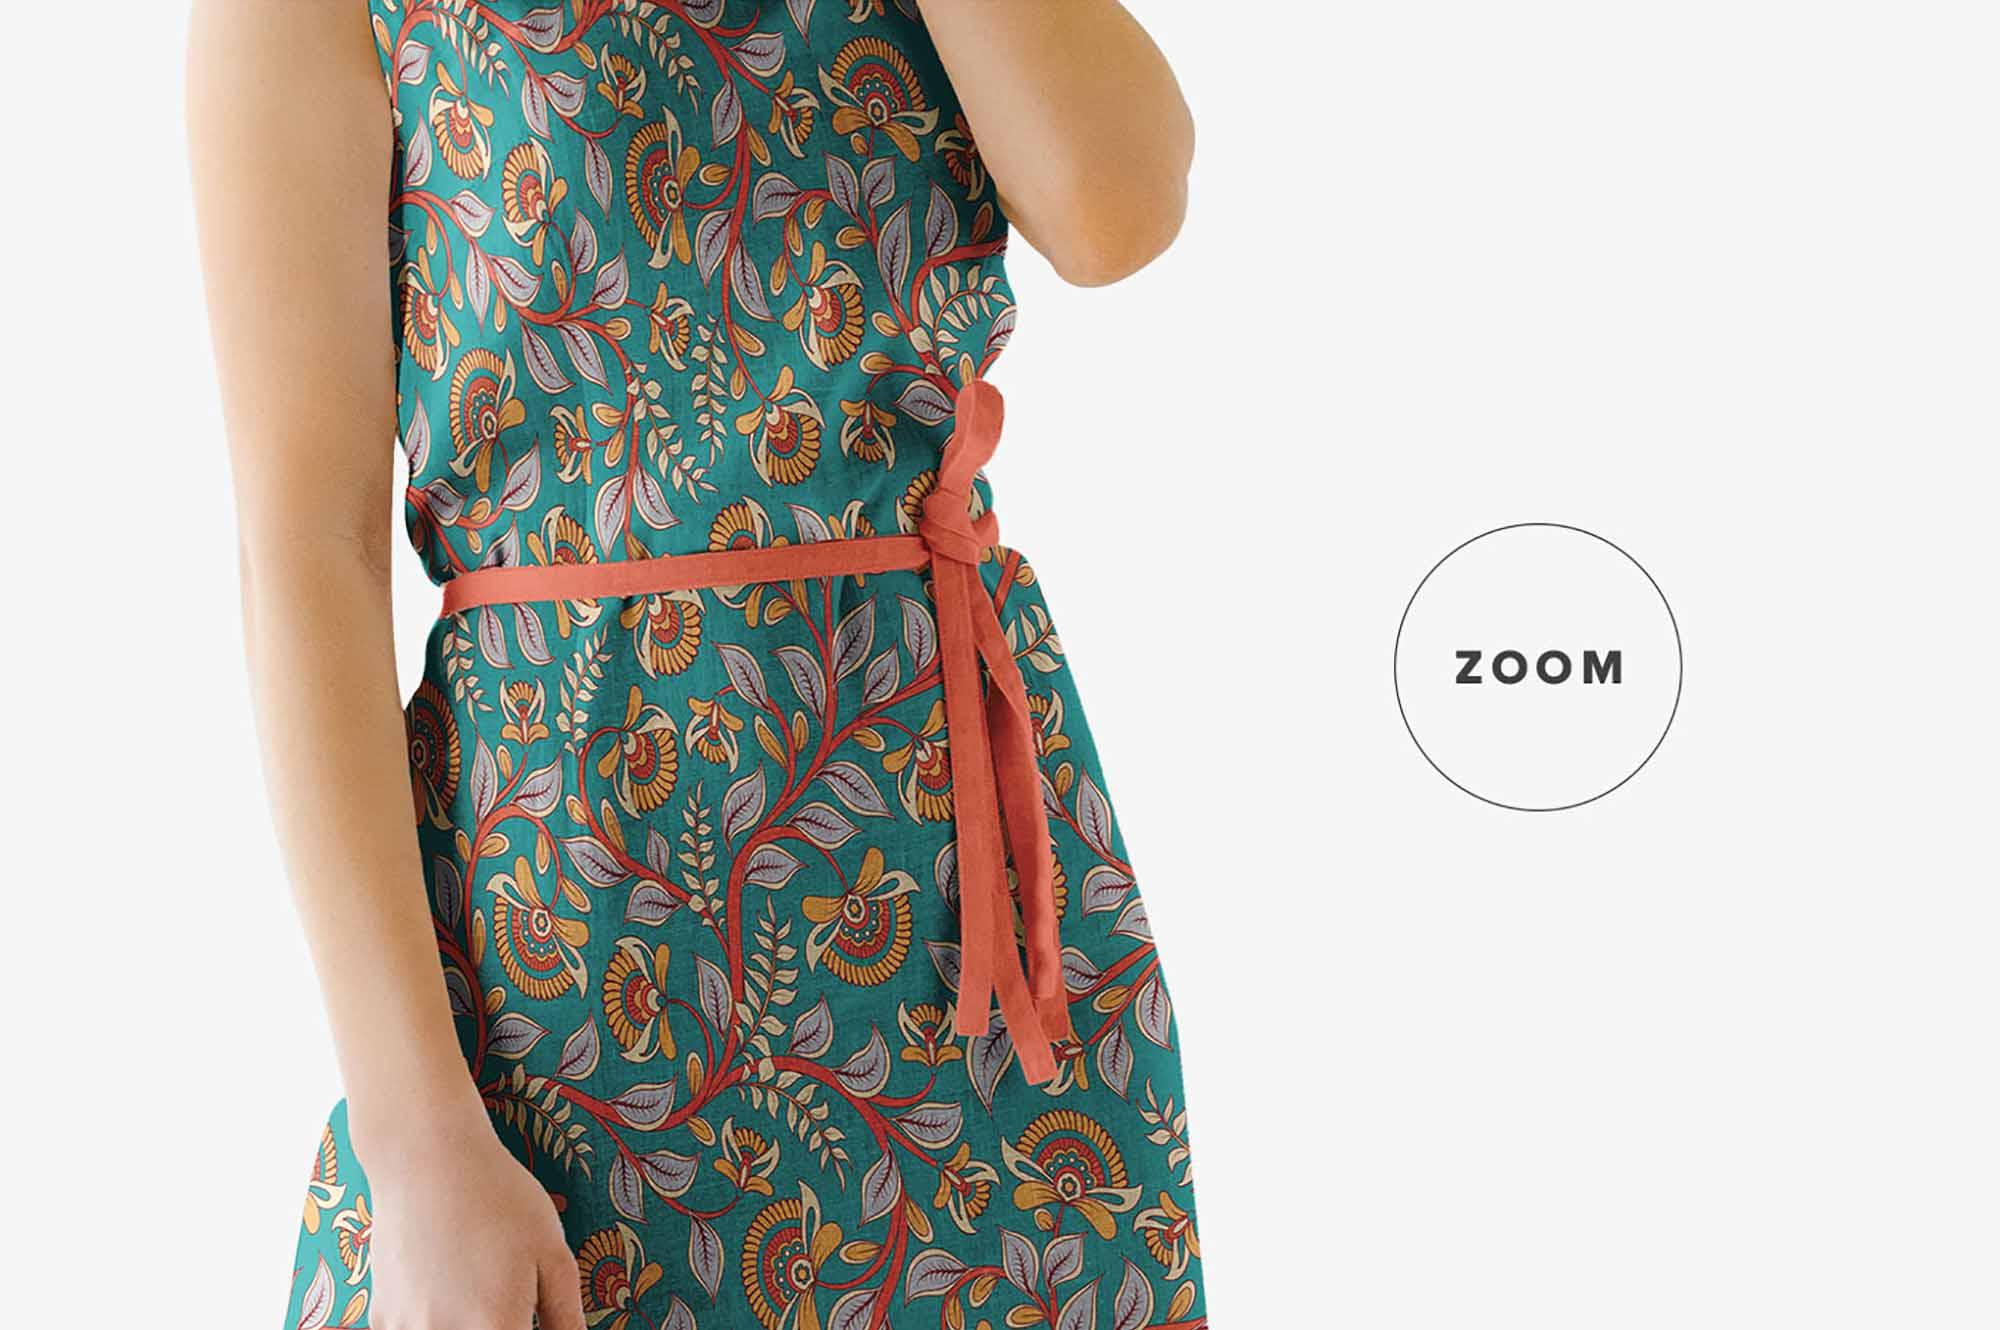 Summer Dress Mockup 4